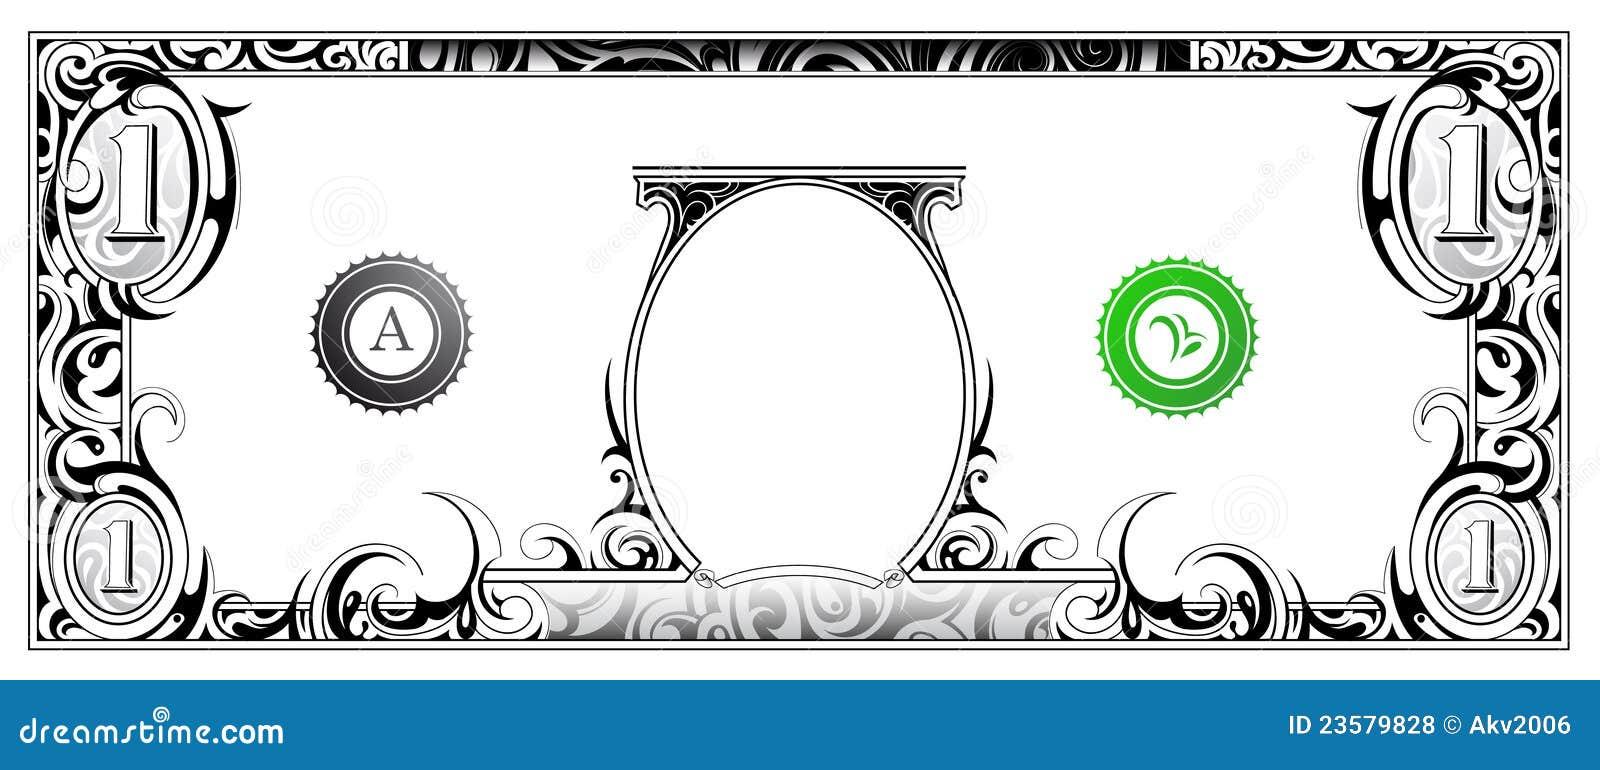 Billet d un dollar am  233 ricain avec l ornement artistique Dollar Bill Icon Vector